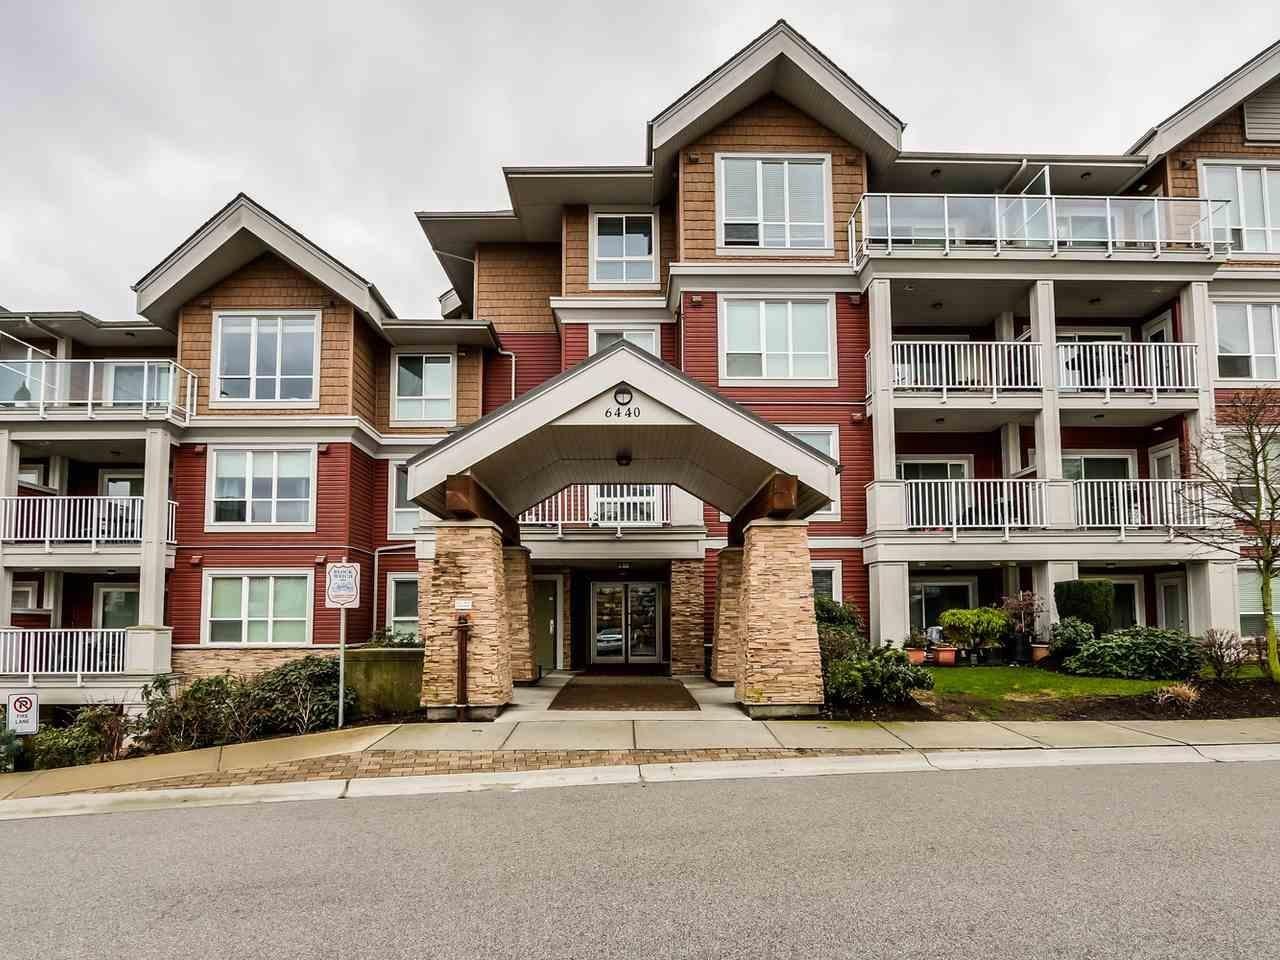 R2027027 - 404 6440 194 STREET, Clayton, Surrey, BC - Apartment Unit